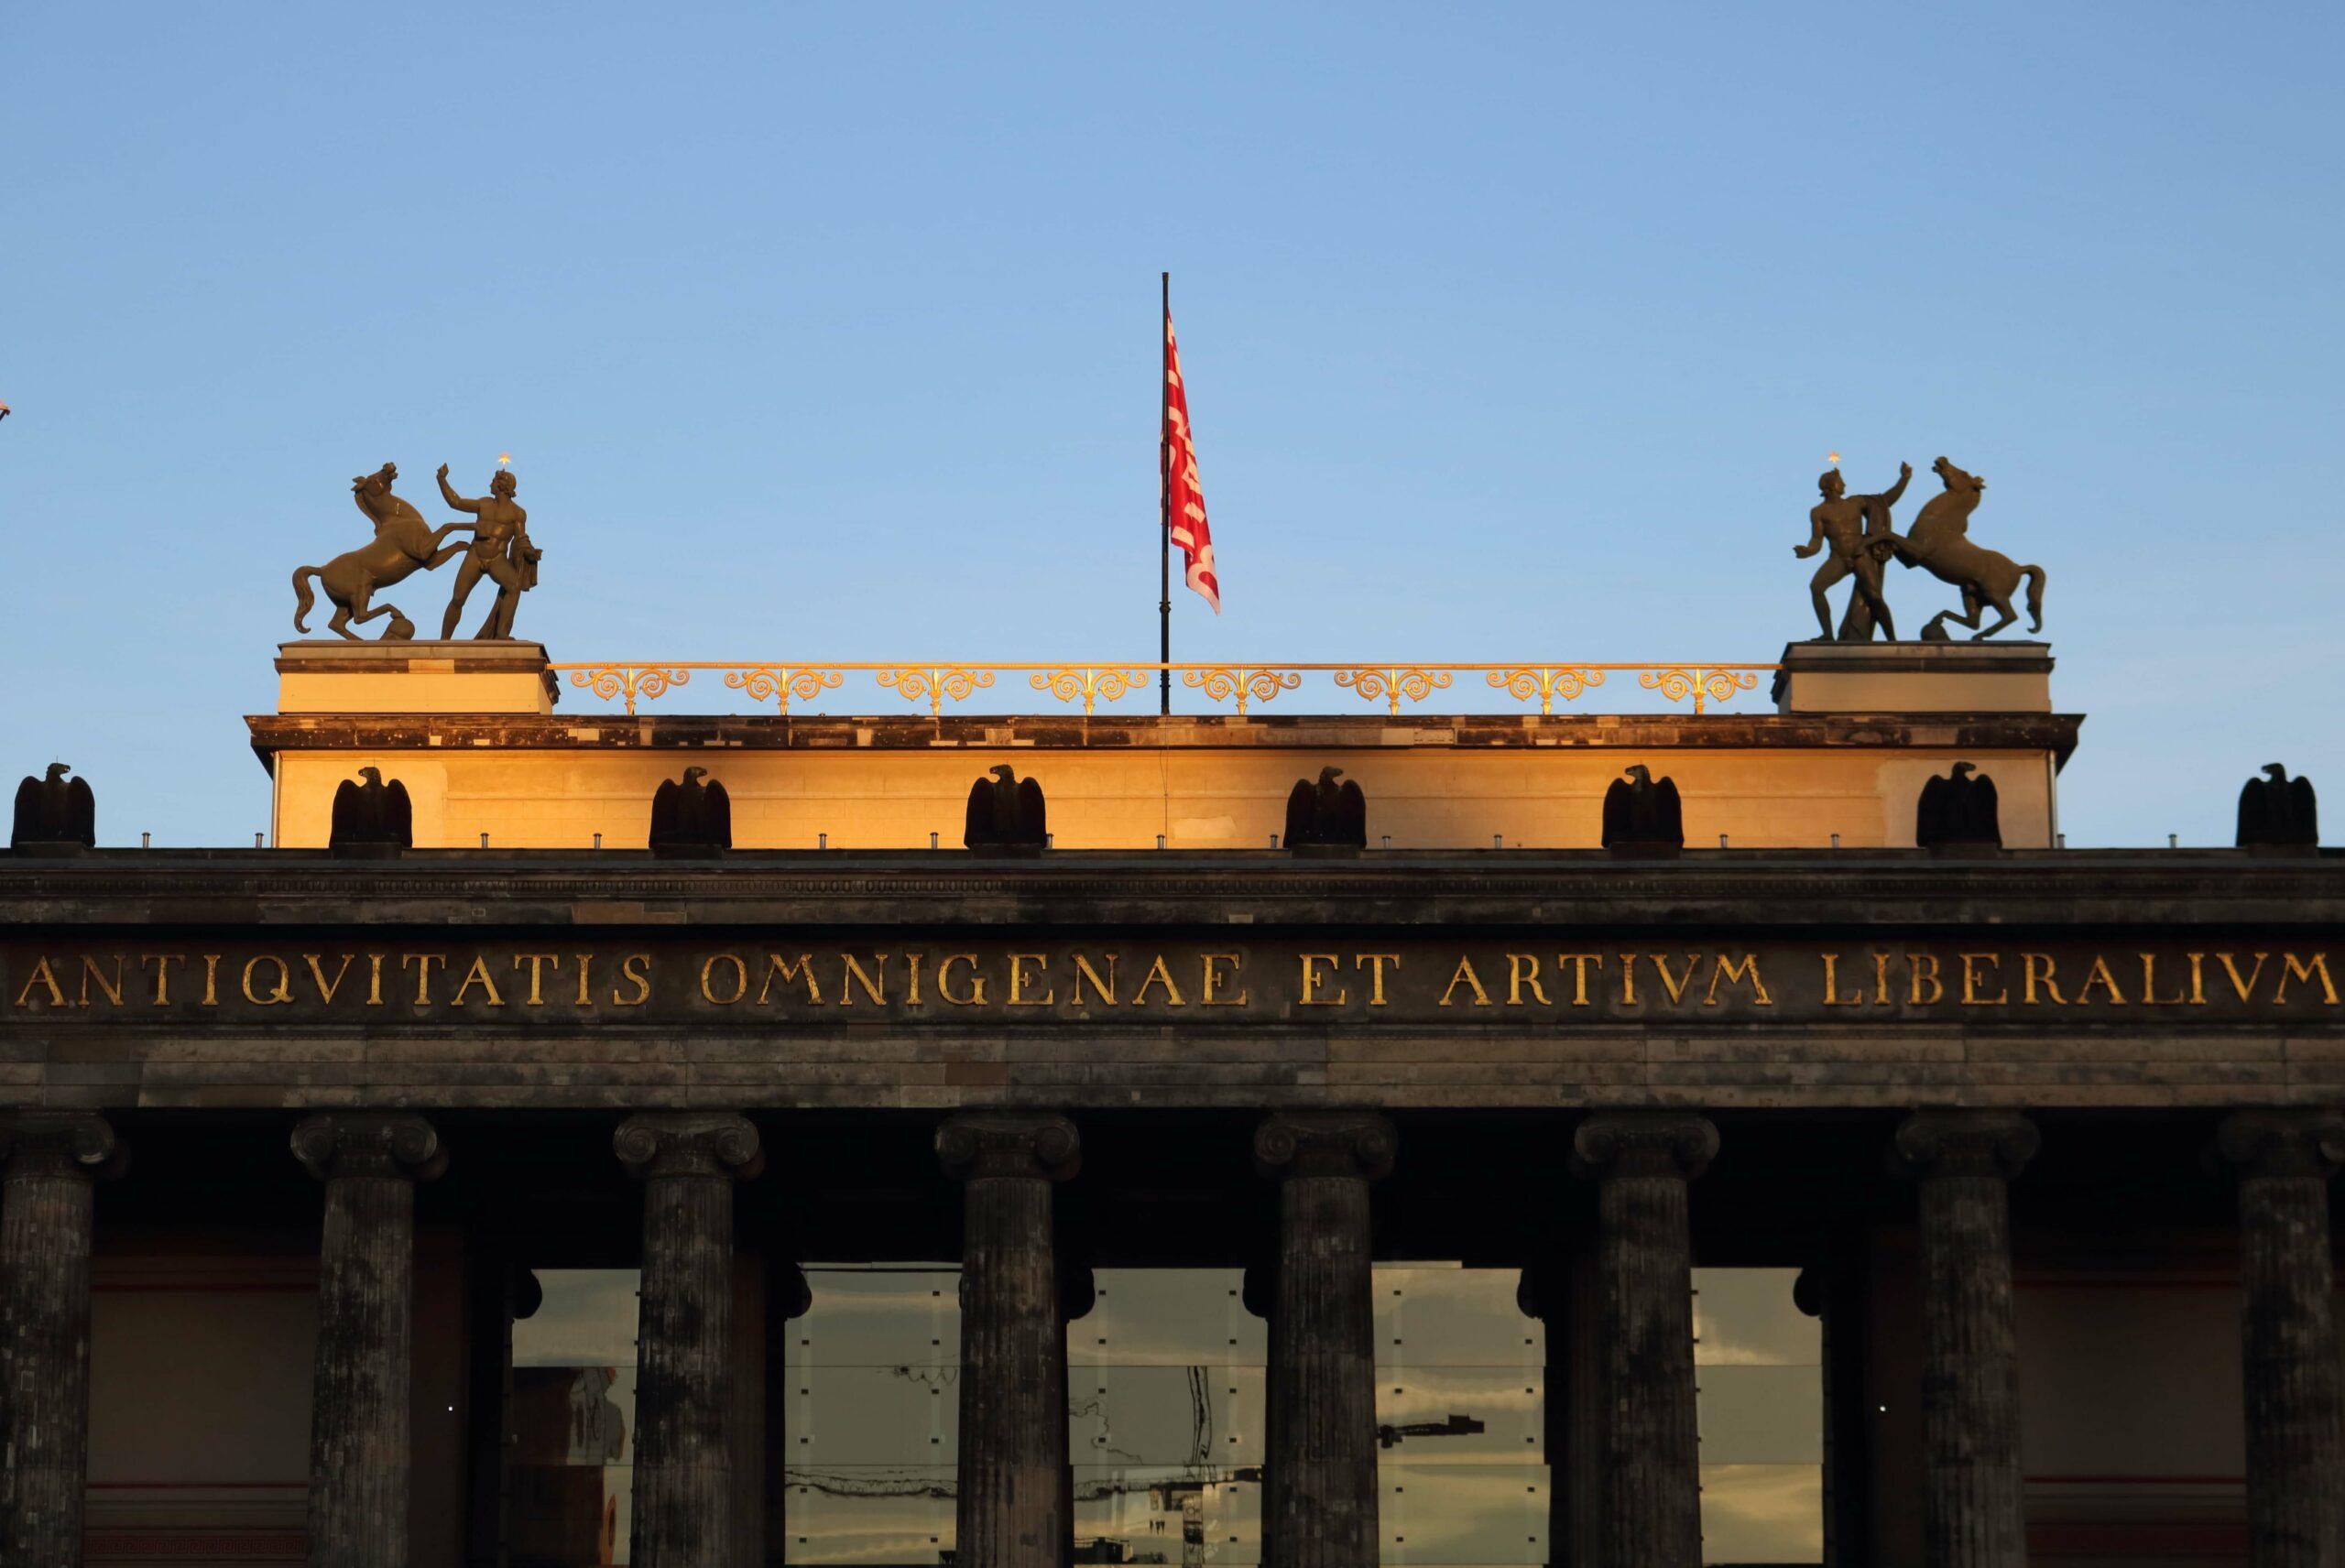 Altes Museum - Bodestrasse